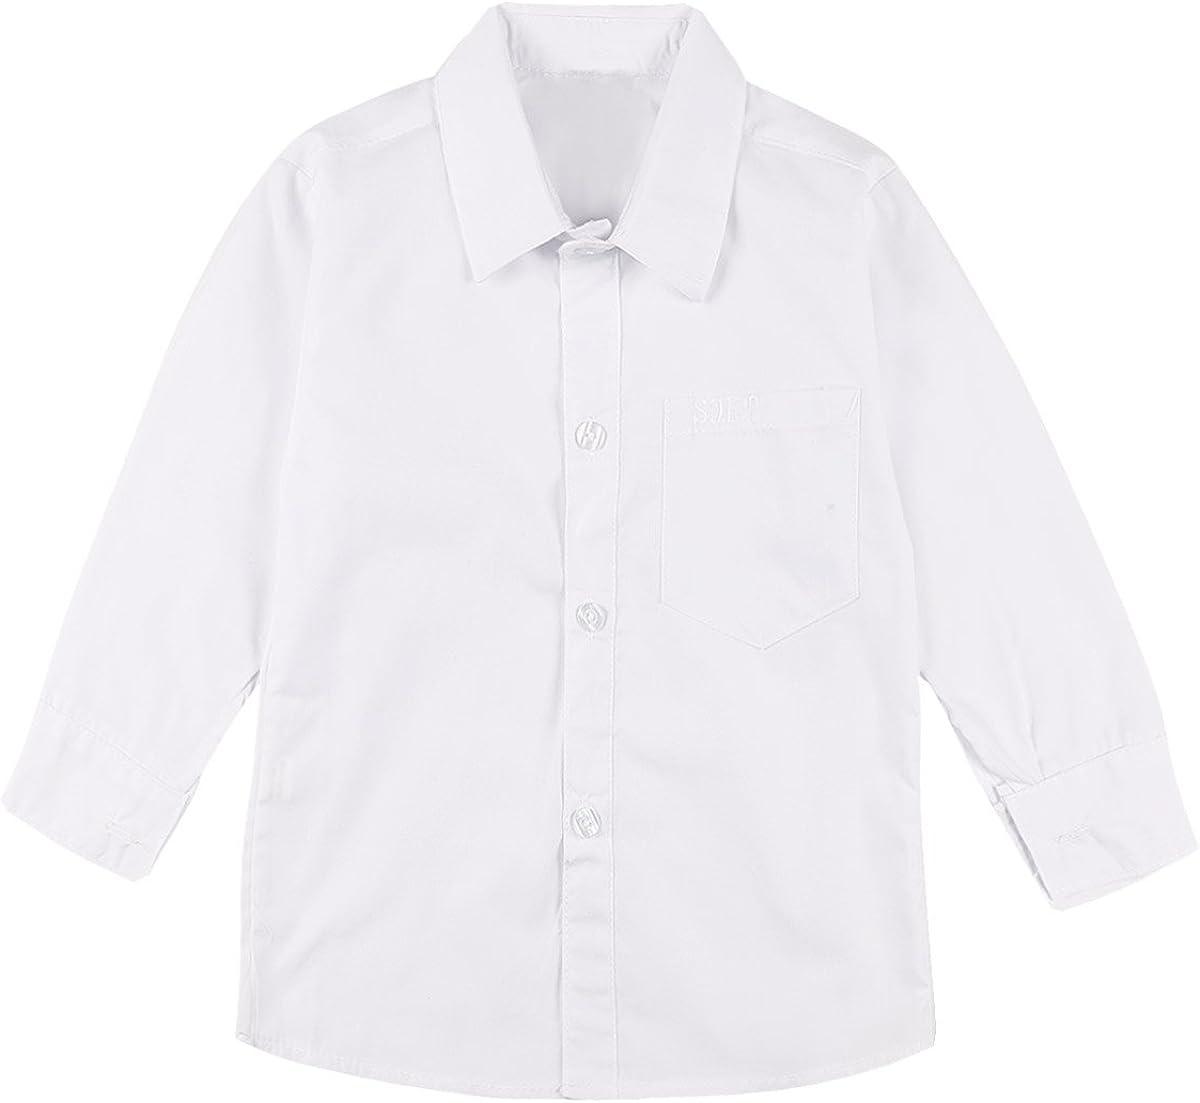 iiniim Kids Boy's School Uniform Long Sleeve Classic Solid Button-Down Oxford Shirt